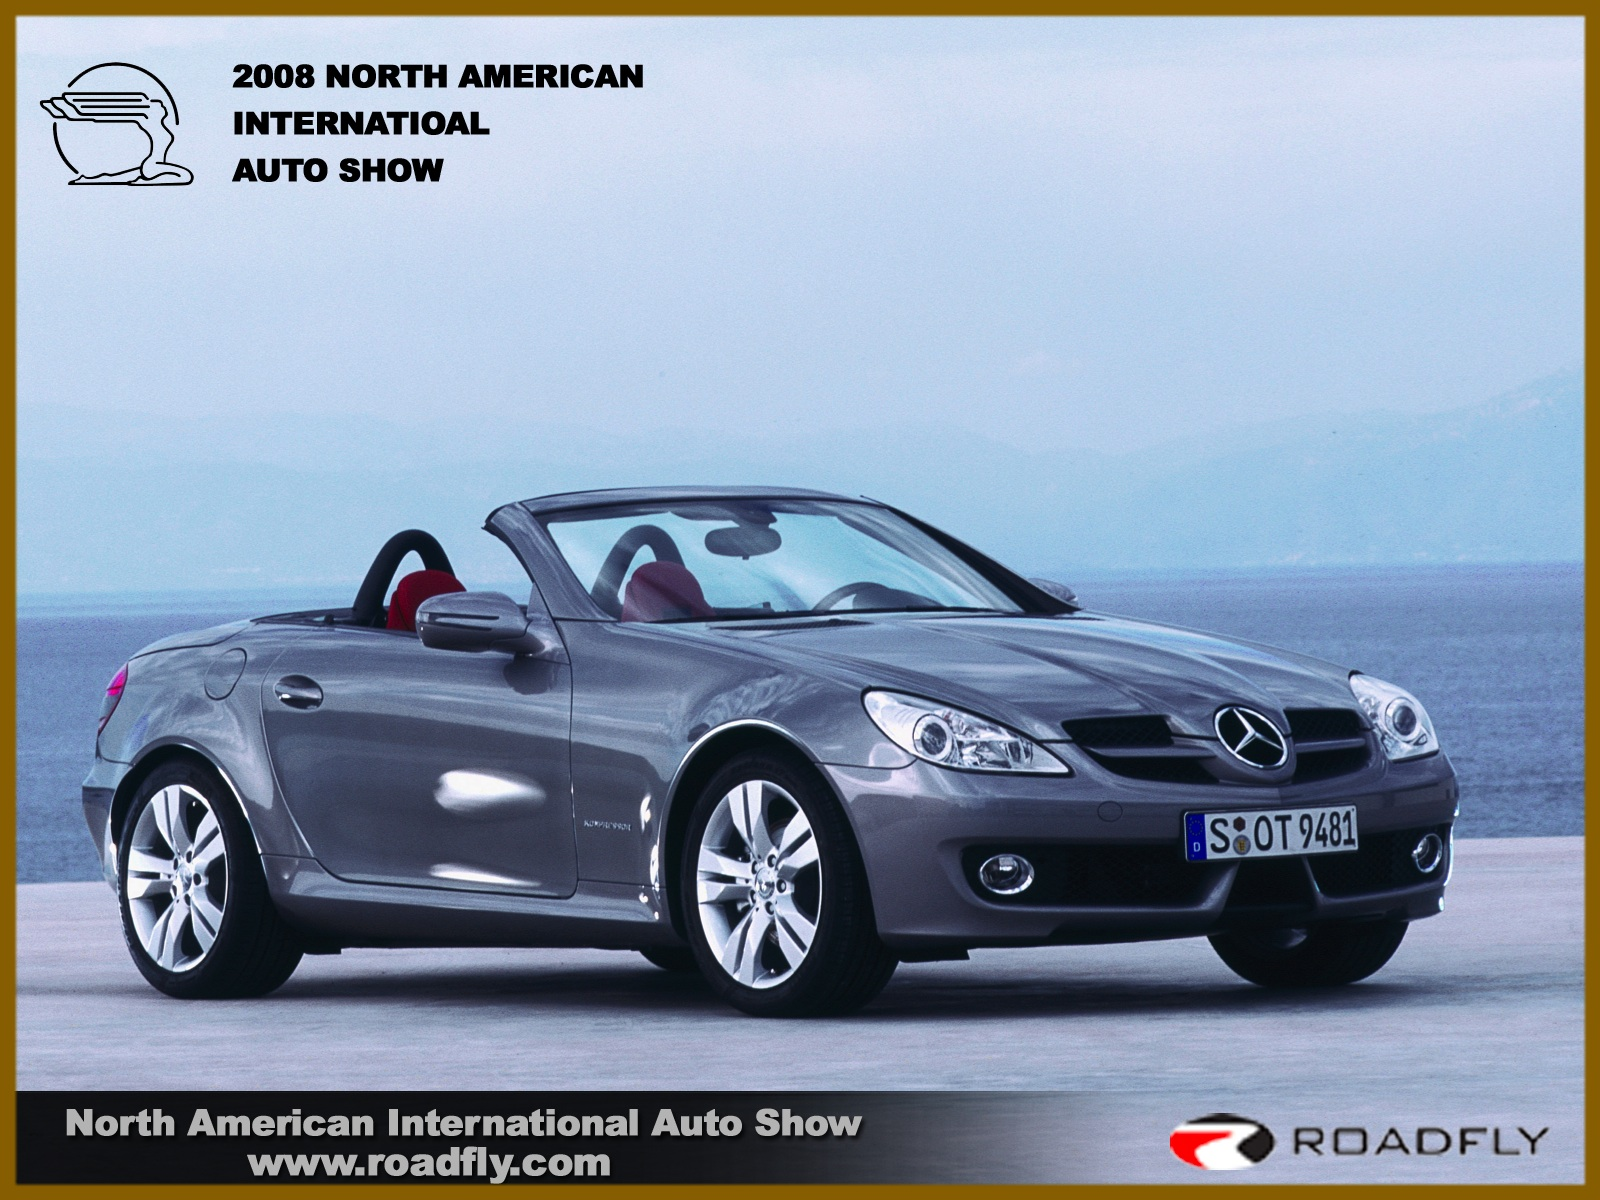 Mercedes benz slk 200 photos reviews news specs buy car for Buy my mercedes benz